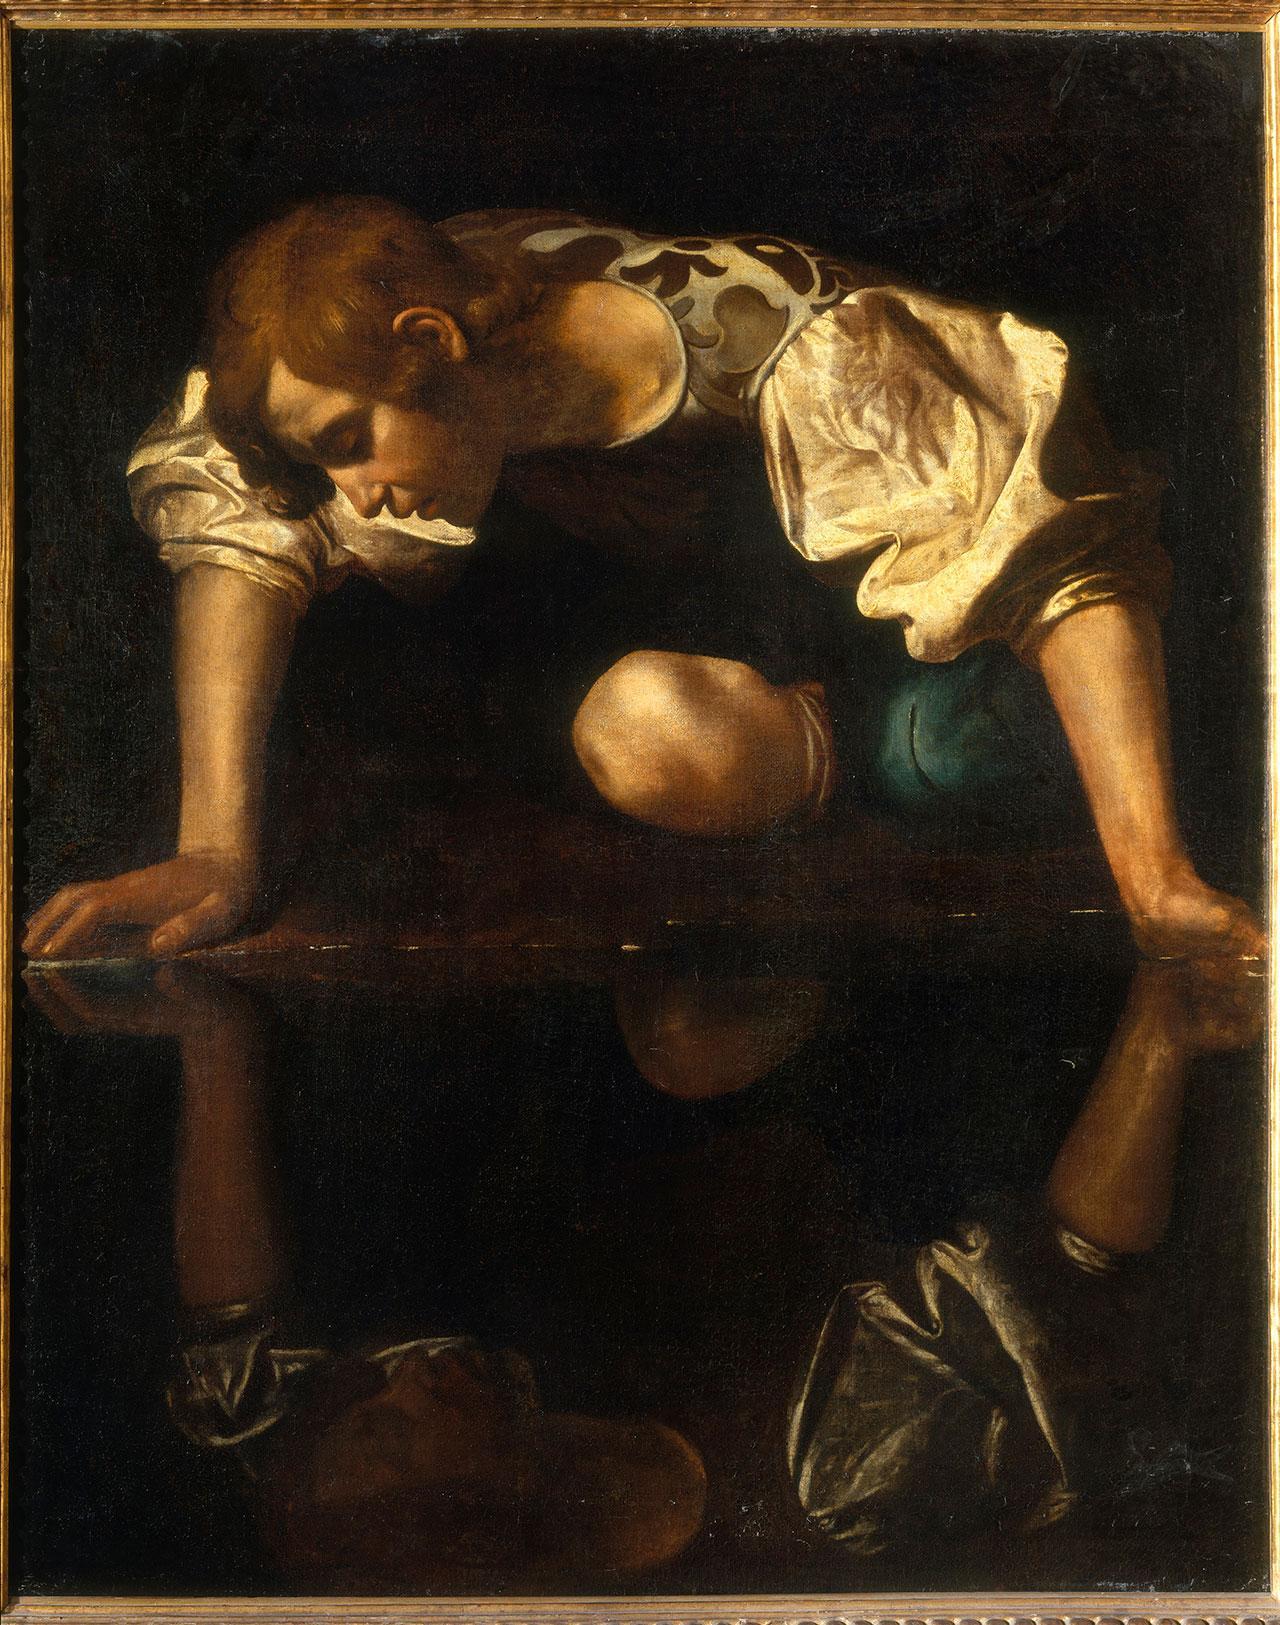 Michelangelo Merisi da Caravaggio, Narcissus